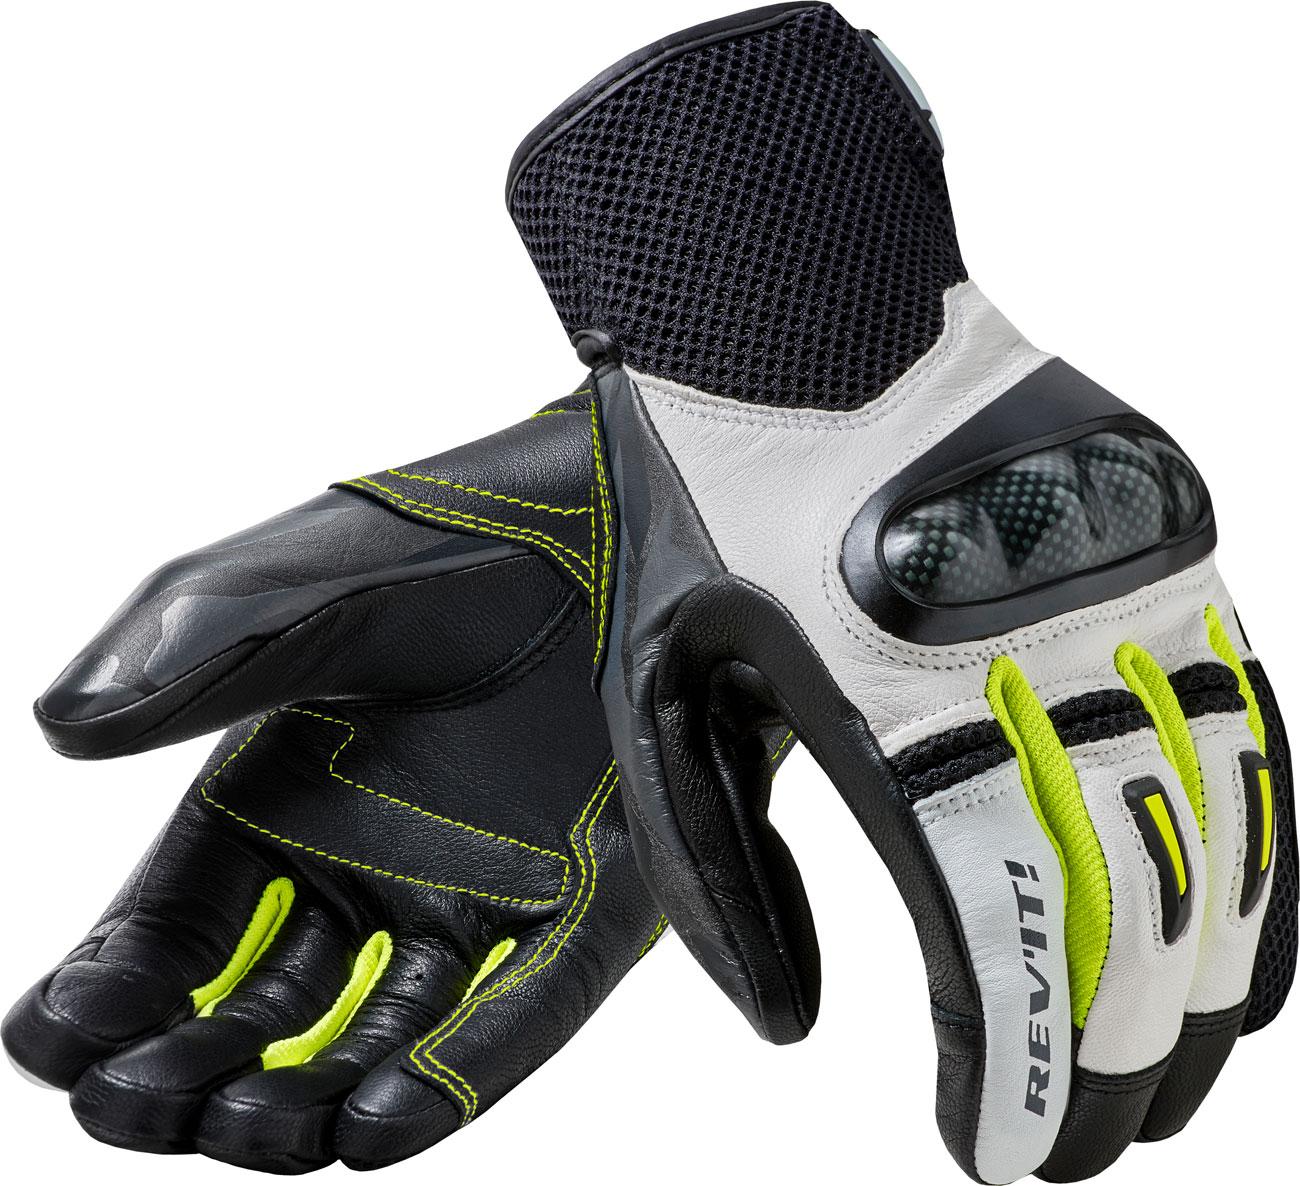 Revit Prime, Handschuhe - Weiß/Gelb - L FGS150-3060-L